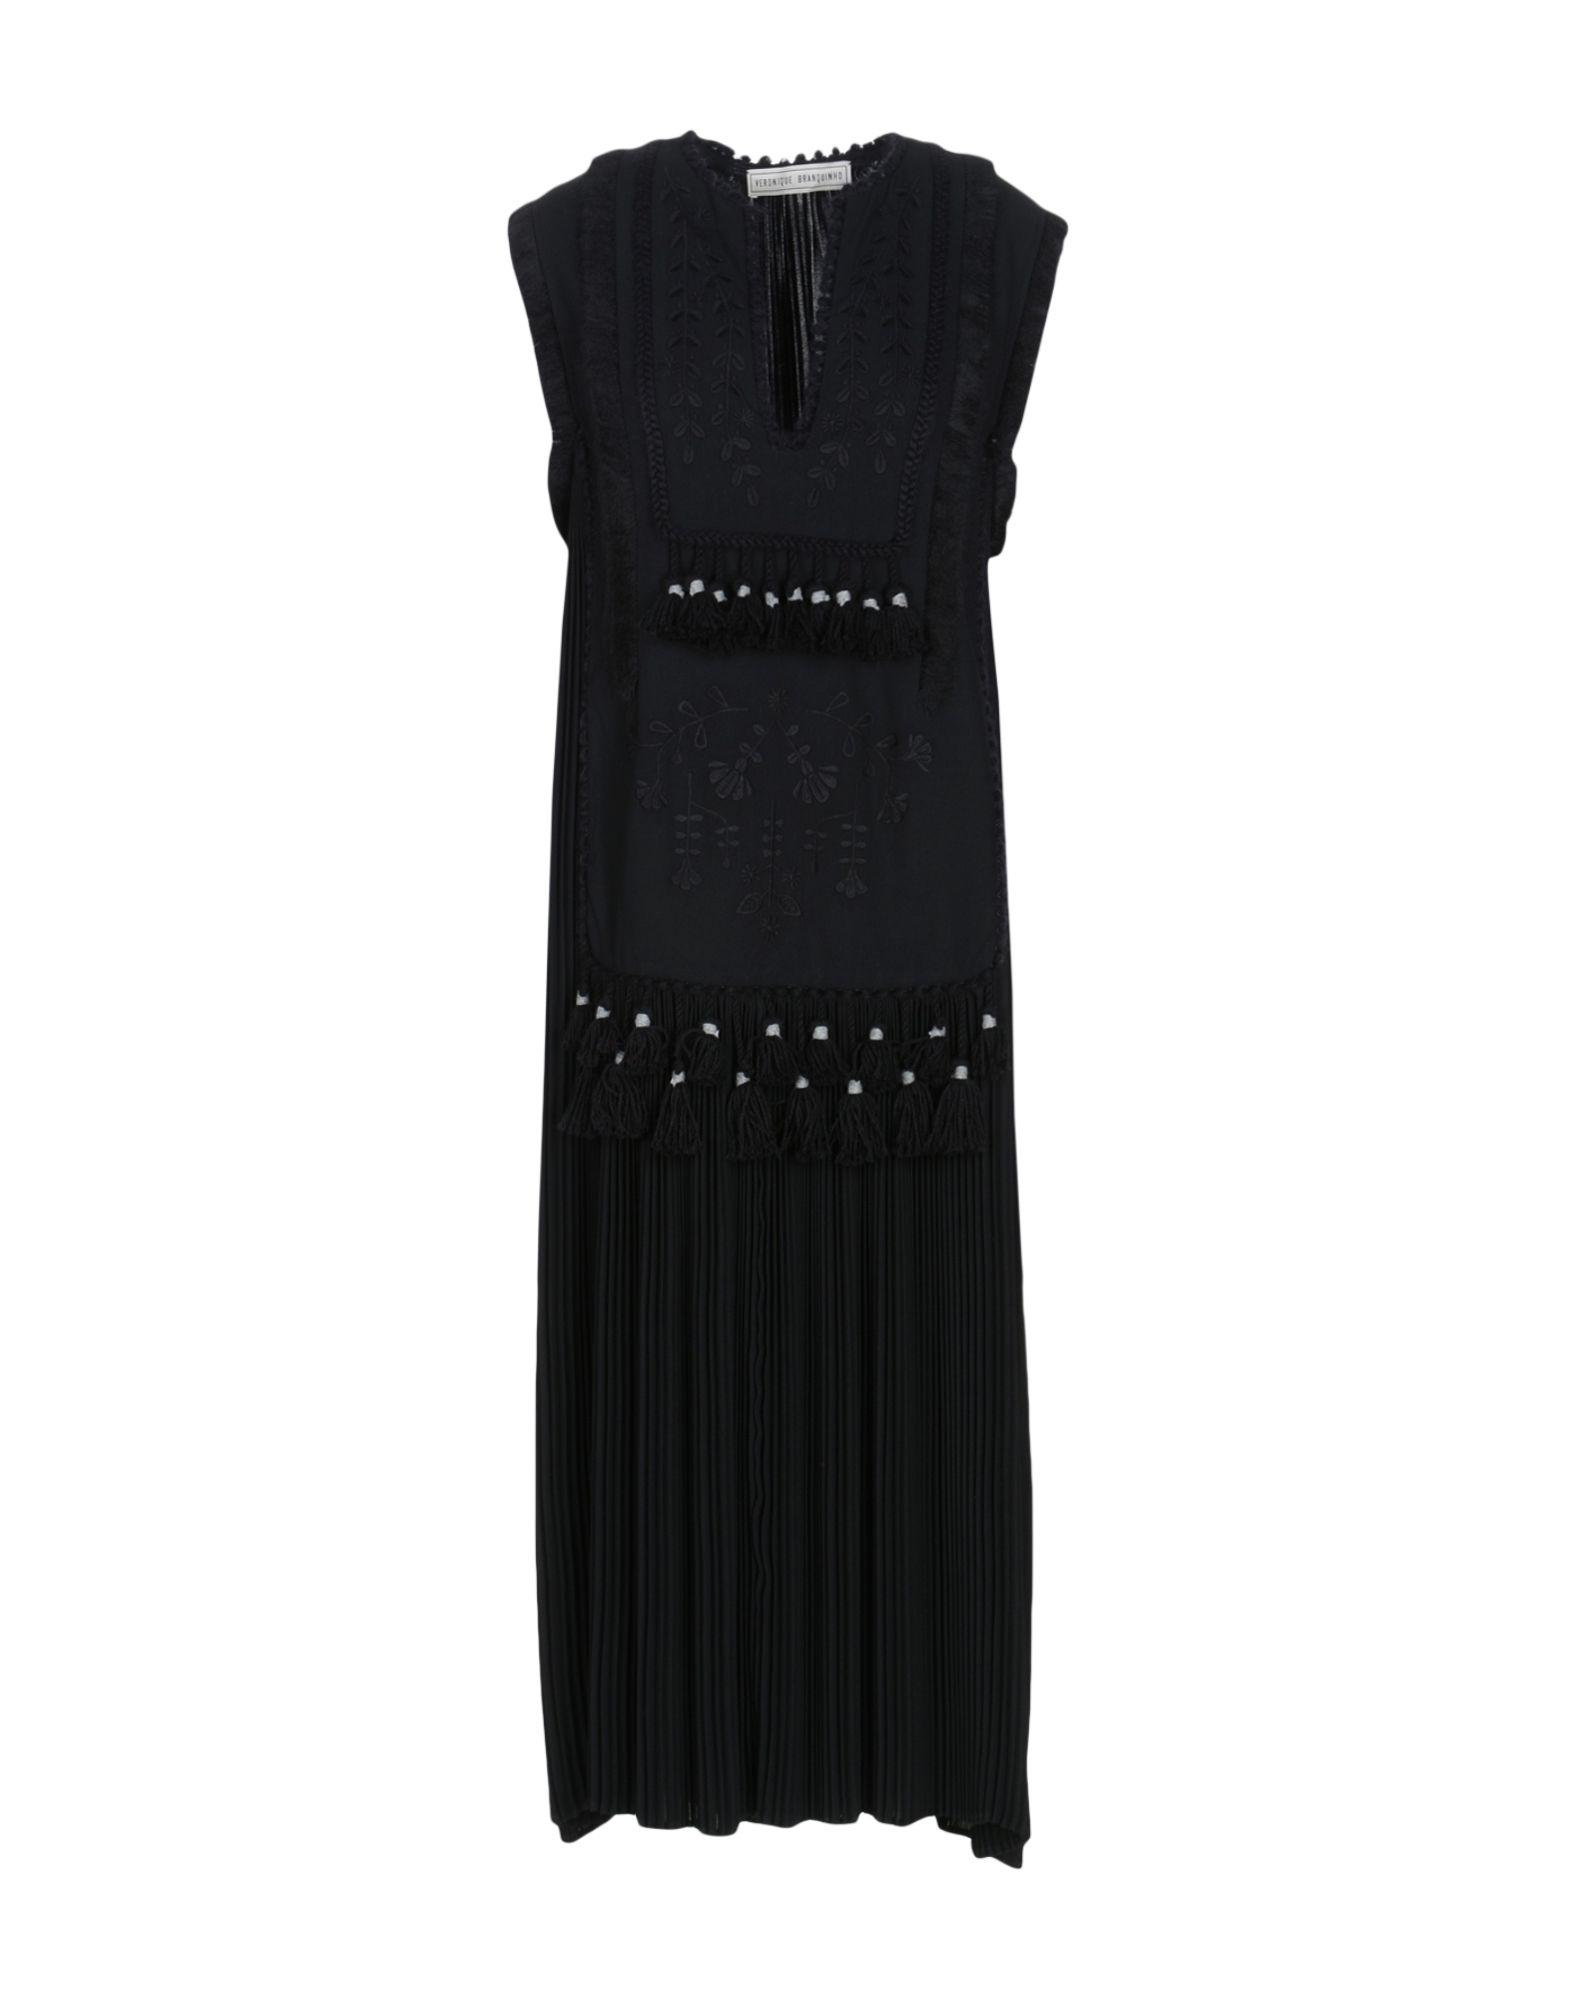 VERONIQUE BRANQUINHO Платье длиной 3/4 veronique branquinho юбка длиной 3 4